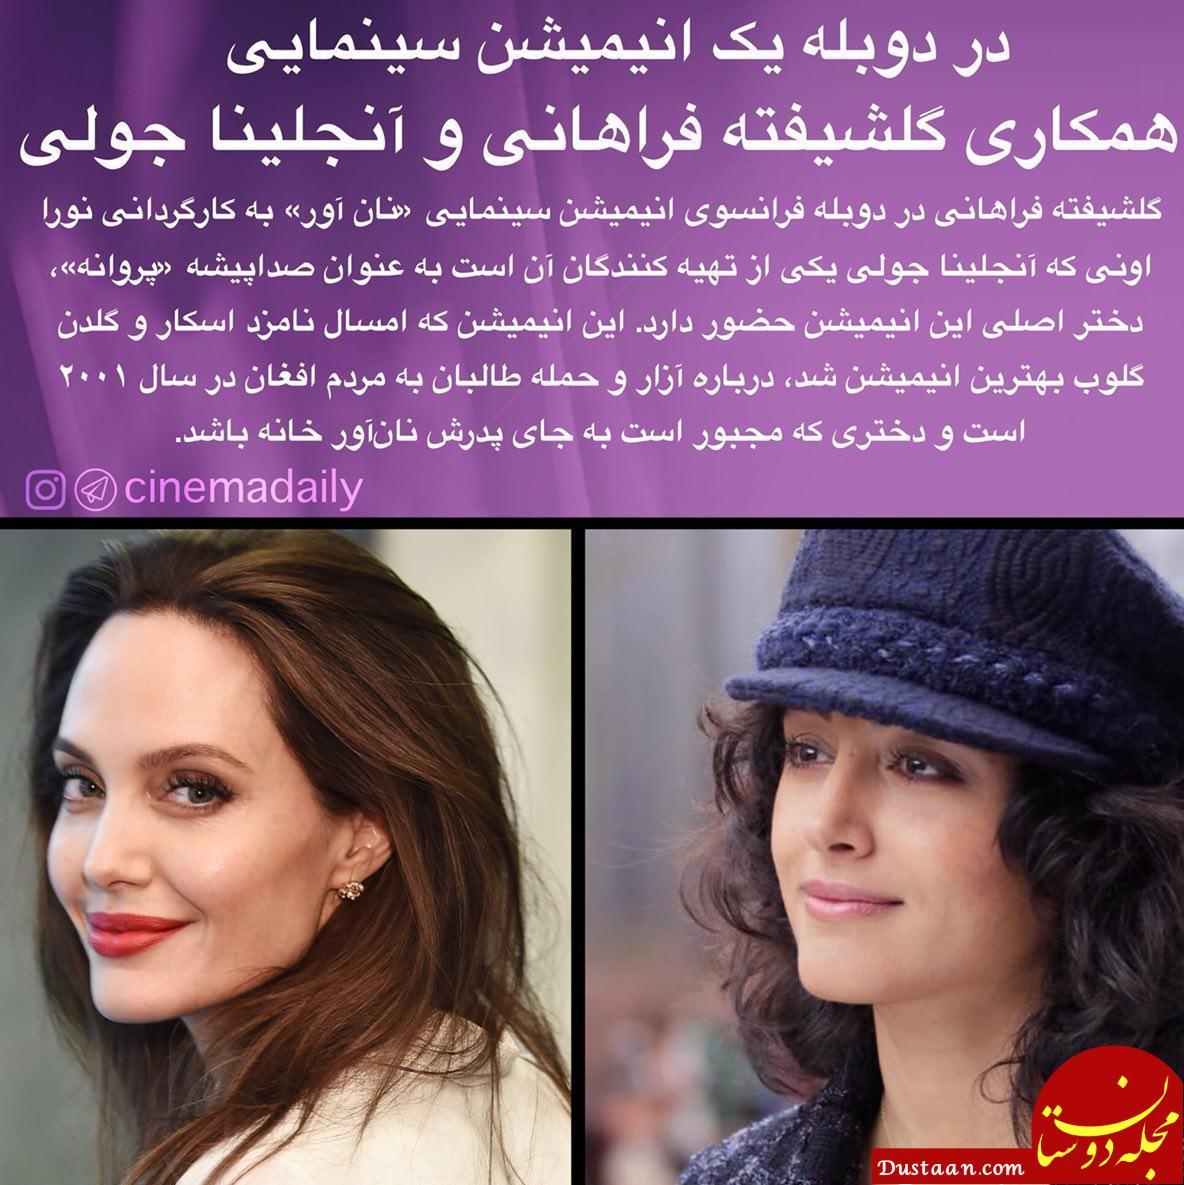 www.dustaan.com همکاری گلشیفته فراهانی و آنجلینا جولی +عکس